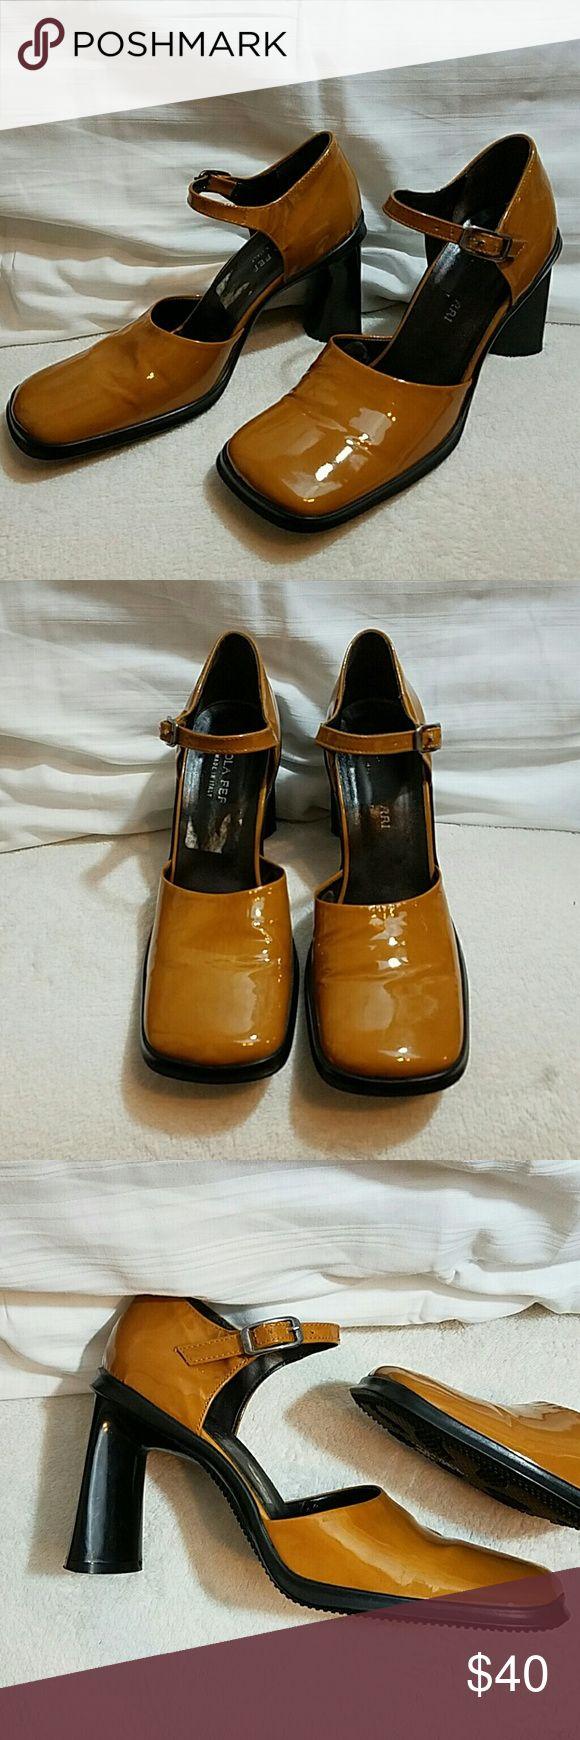 PAOLA FERRI Italian Leather Upper Heels PAOLA FERRI Italian Leather Upper Heels with ankle strap. Made in Italy.   Size 9 US, 39 Euro Paoli Ferri Shoes